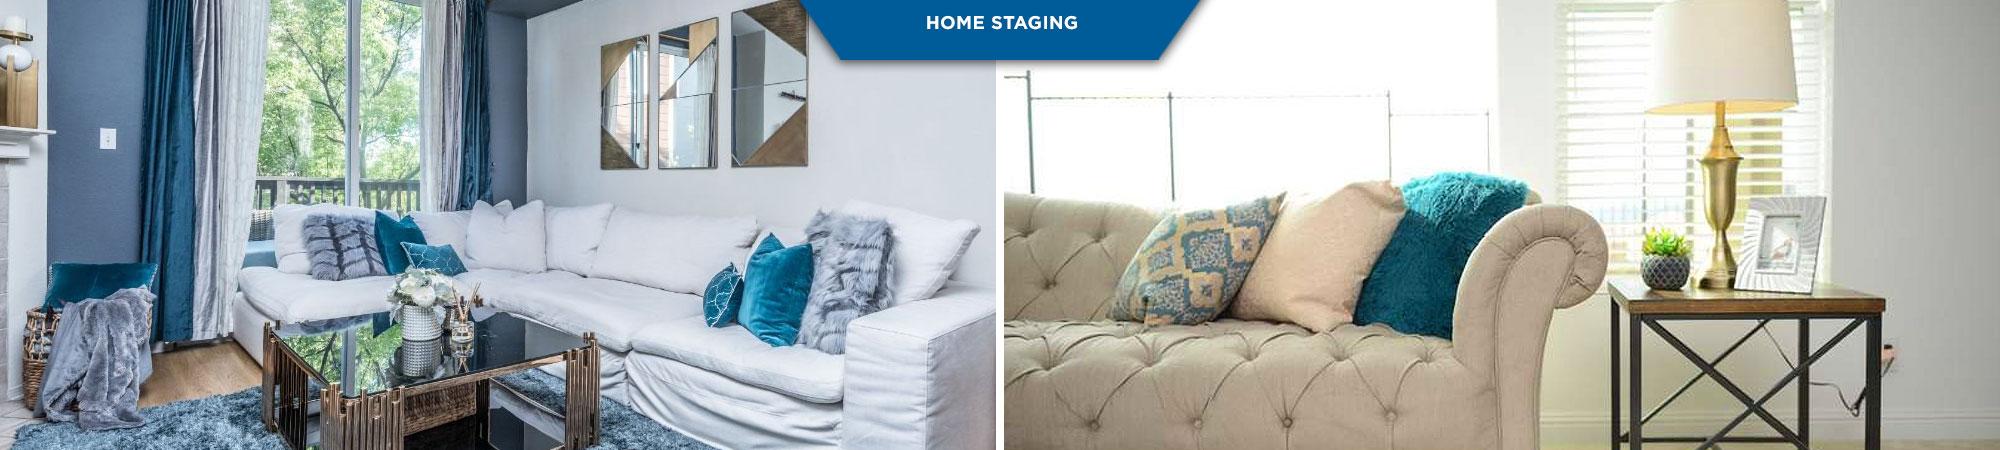 Home staging & design